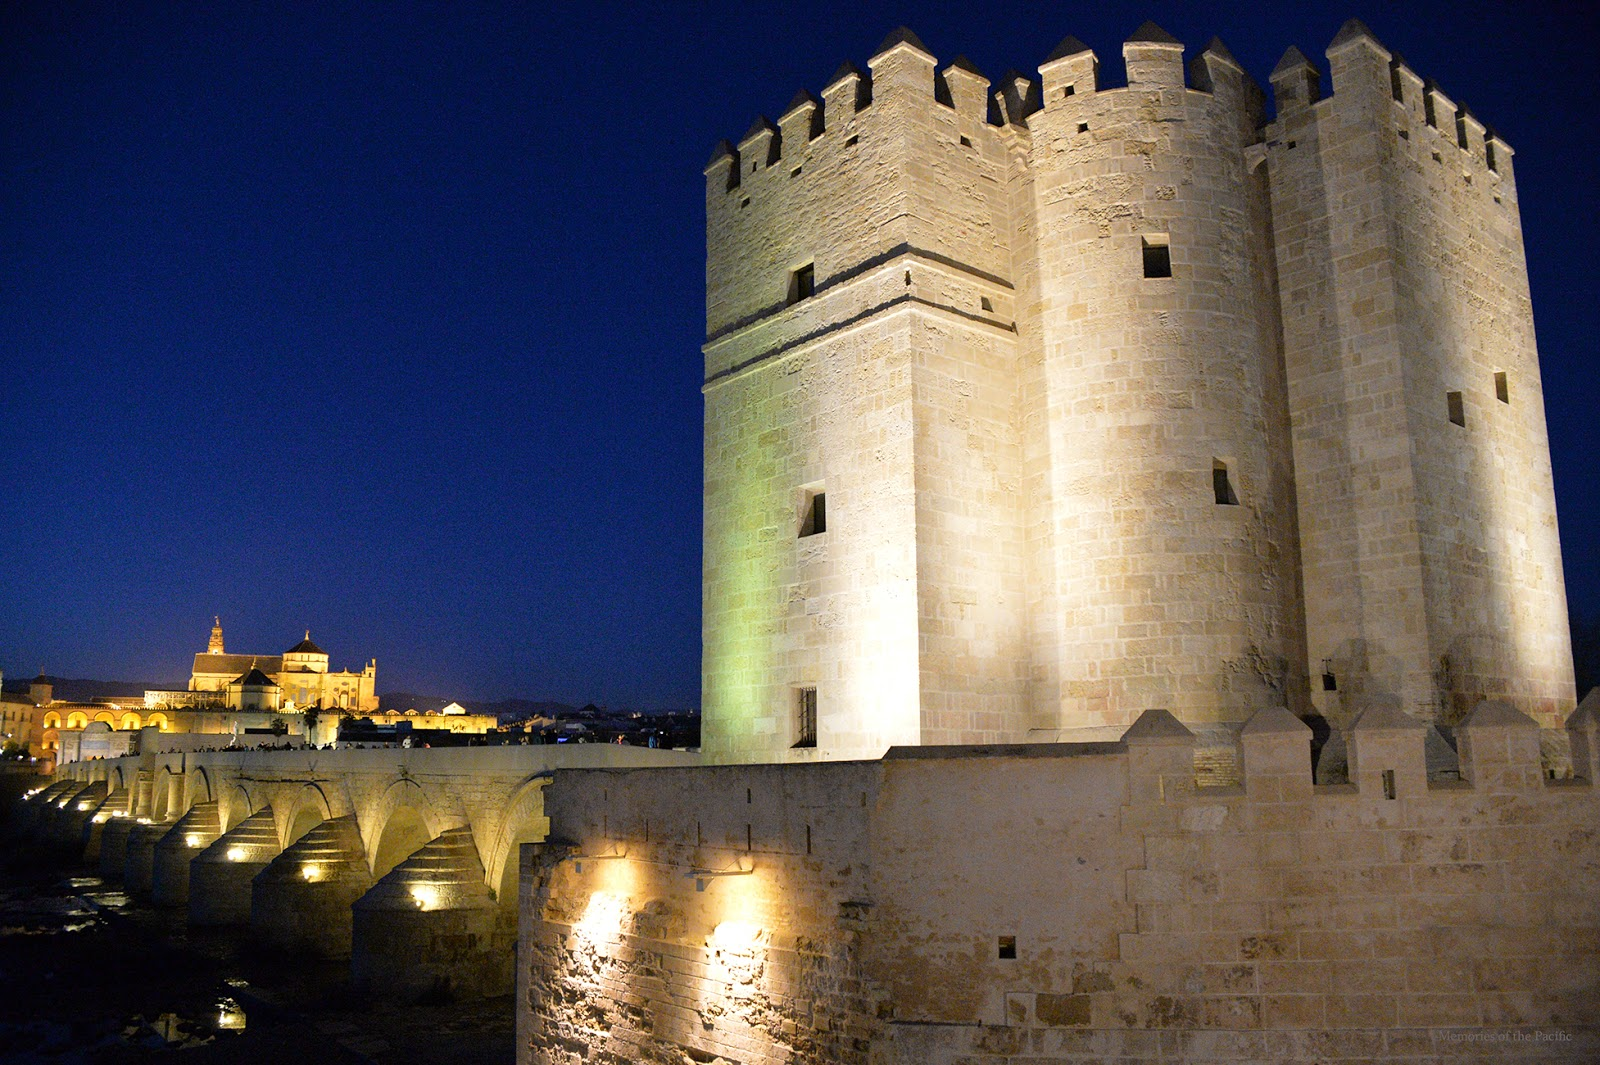 puente romano torre de calahorra cordoba españa